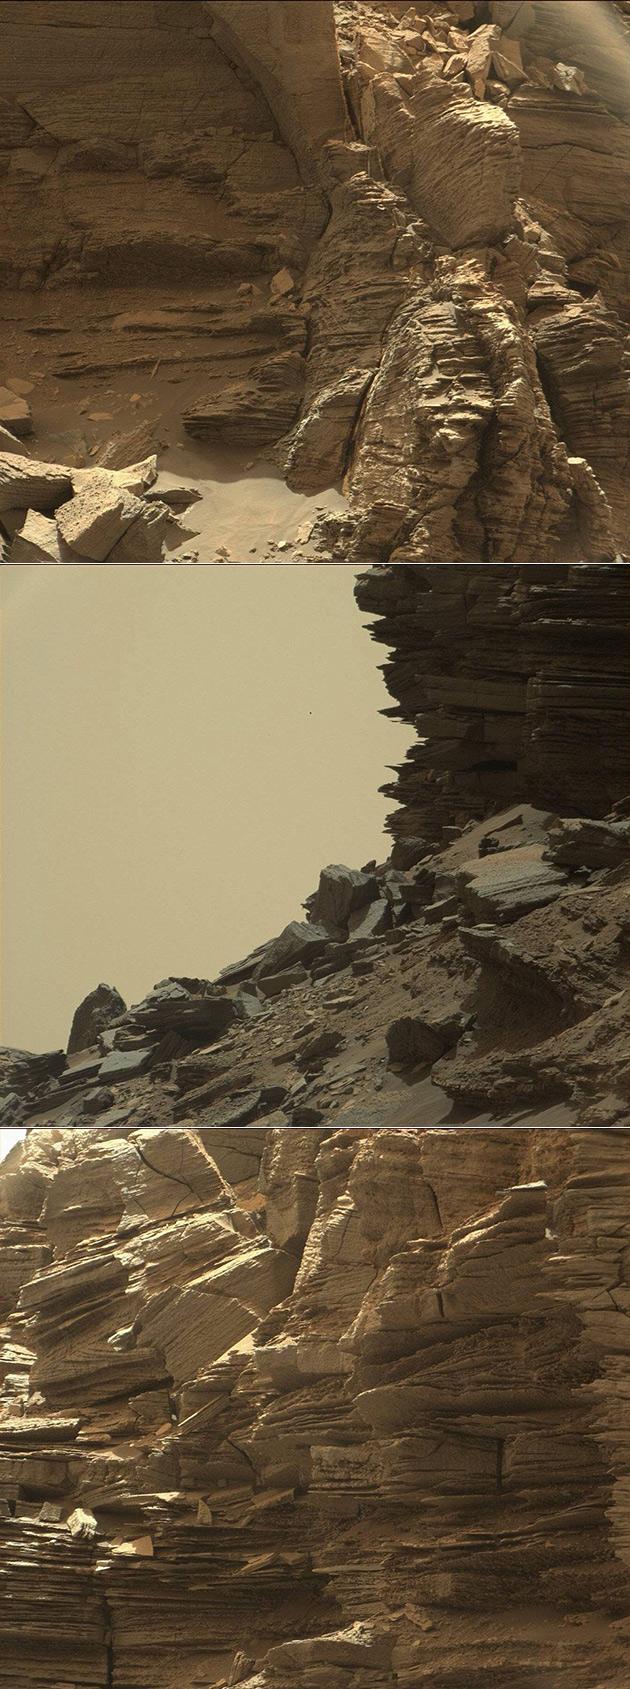 New Mars Photos